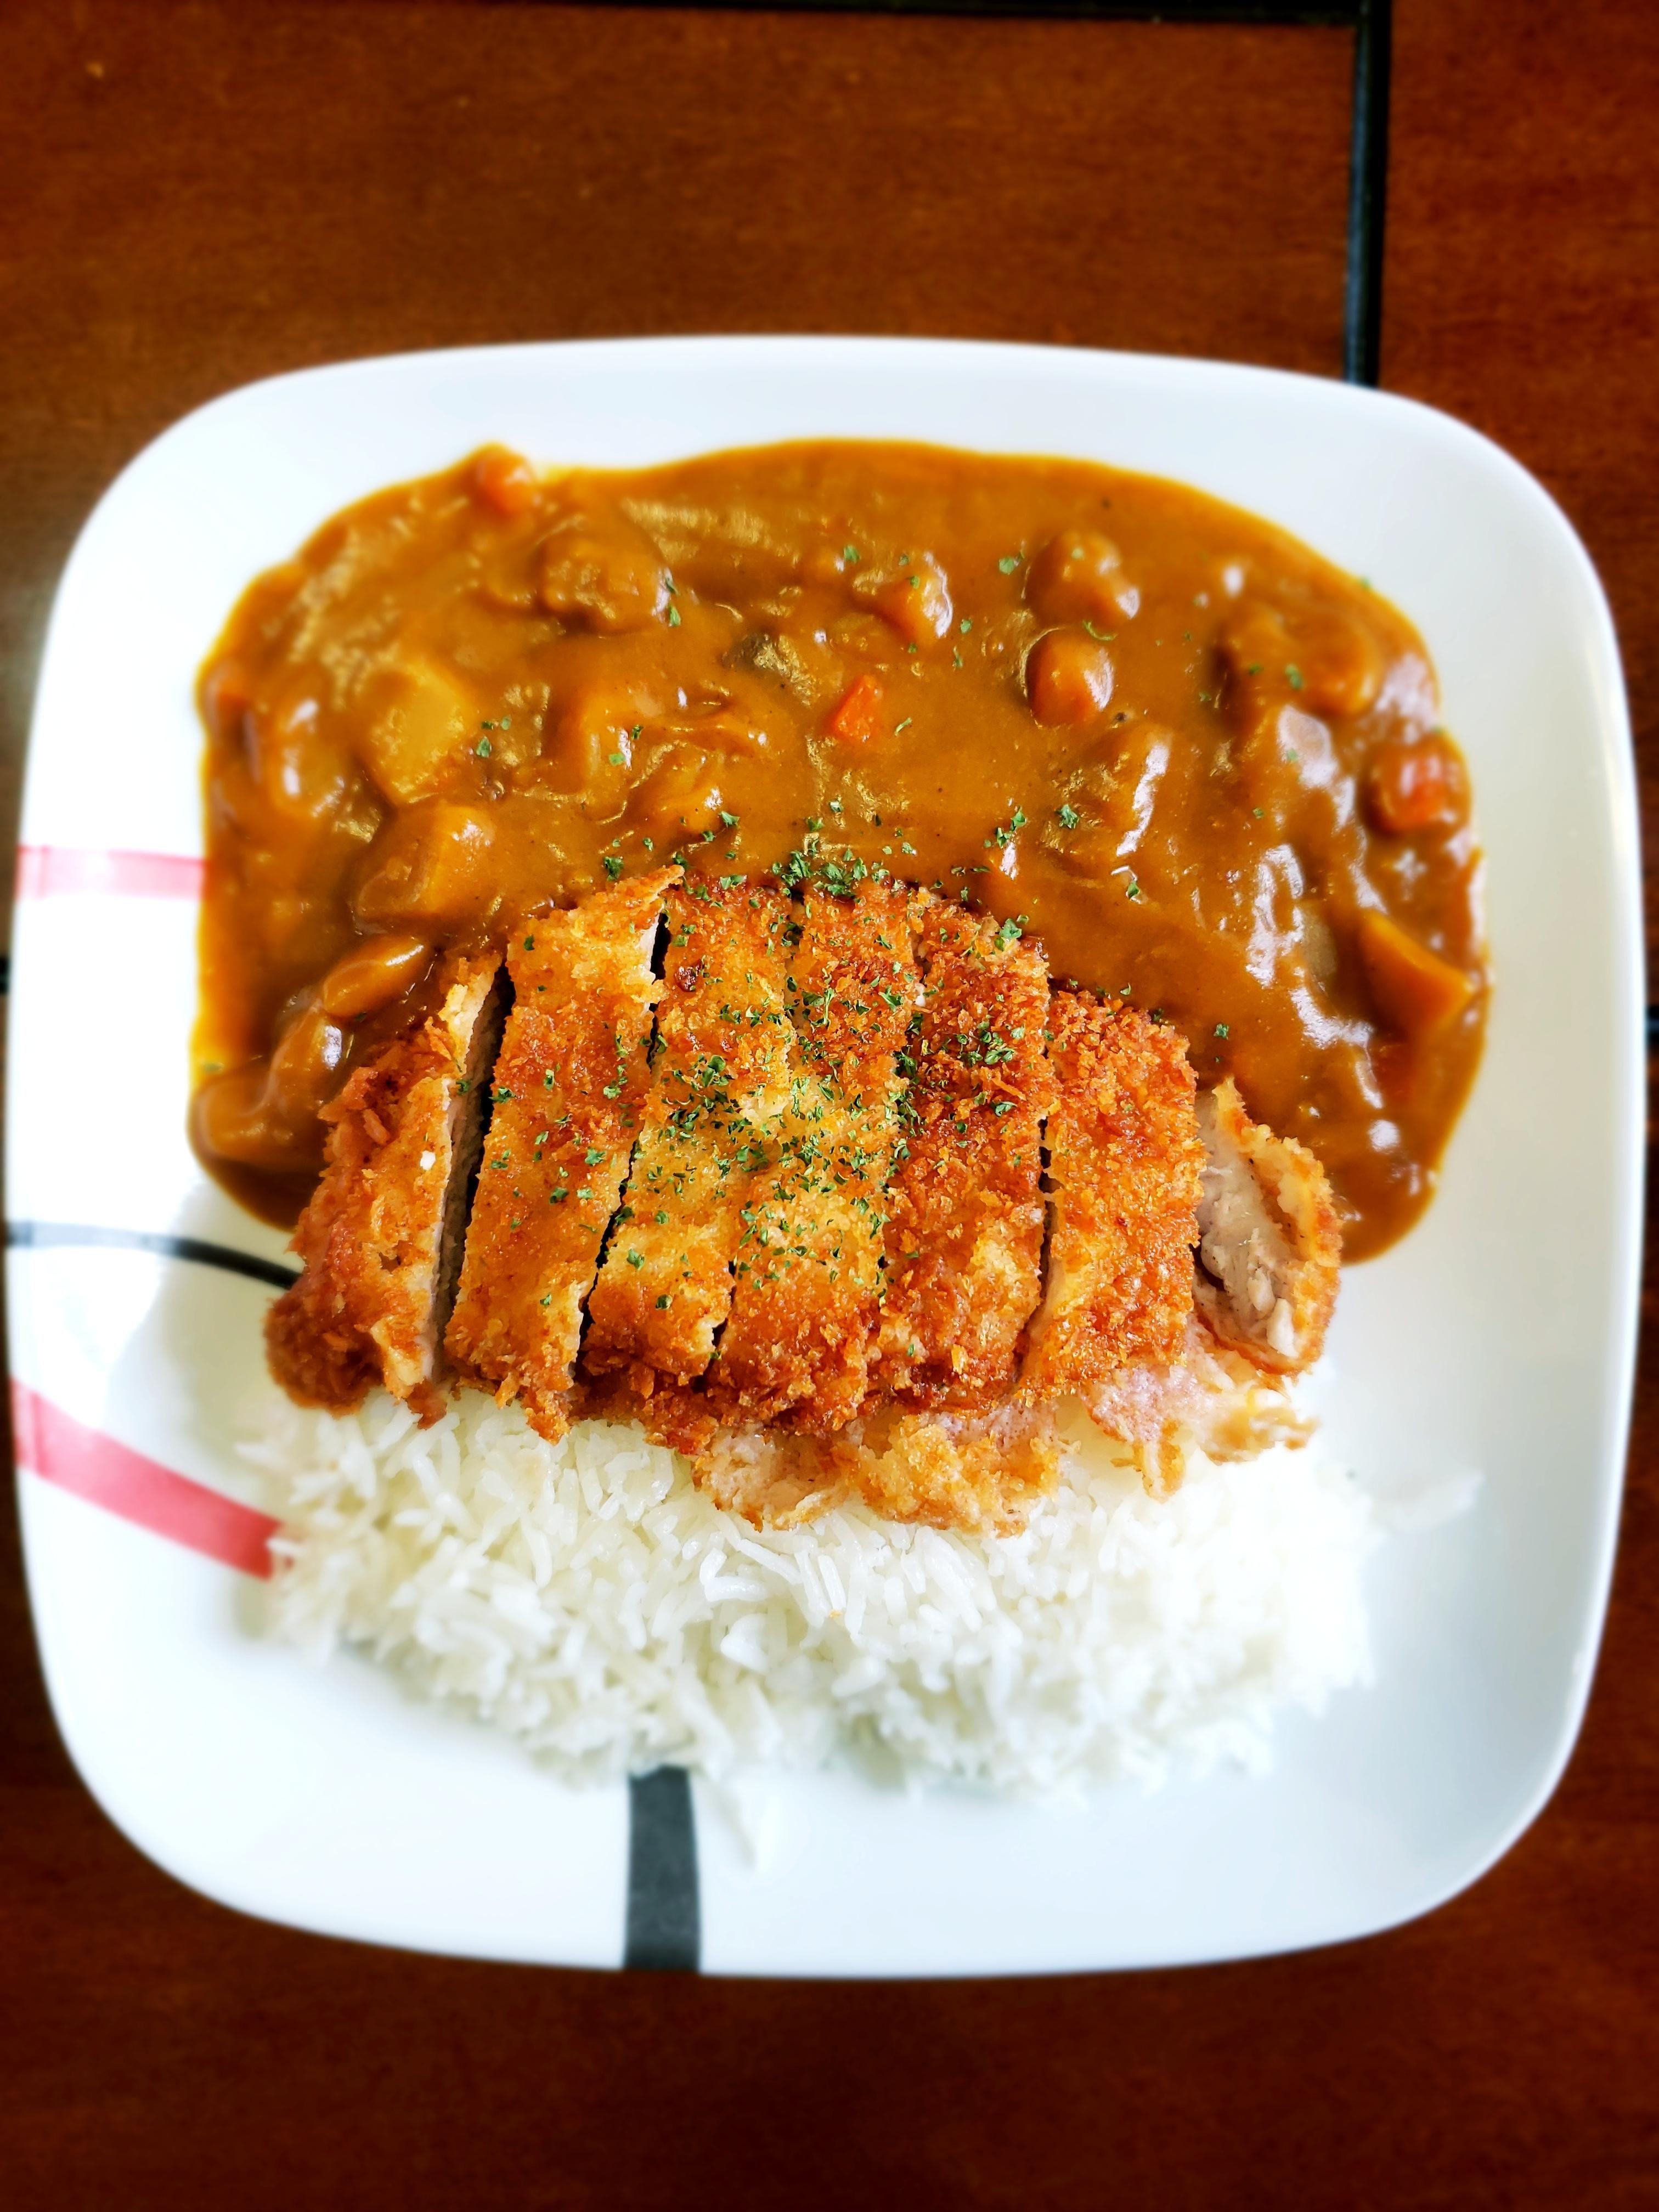 Homemade Katsu Kare Japanese Pork Cutlet Curry For Lunch In 2020 Pork Cutlet Recipes Pork Cutlets Food